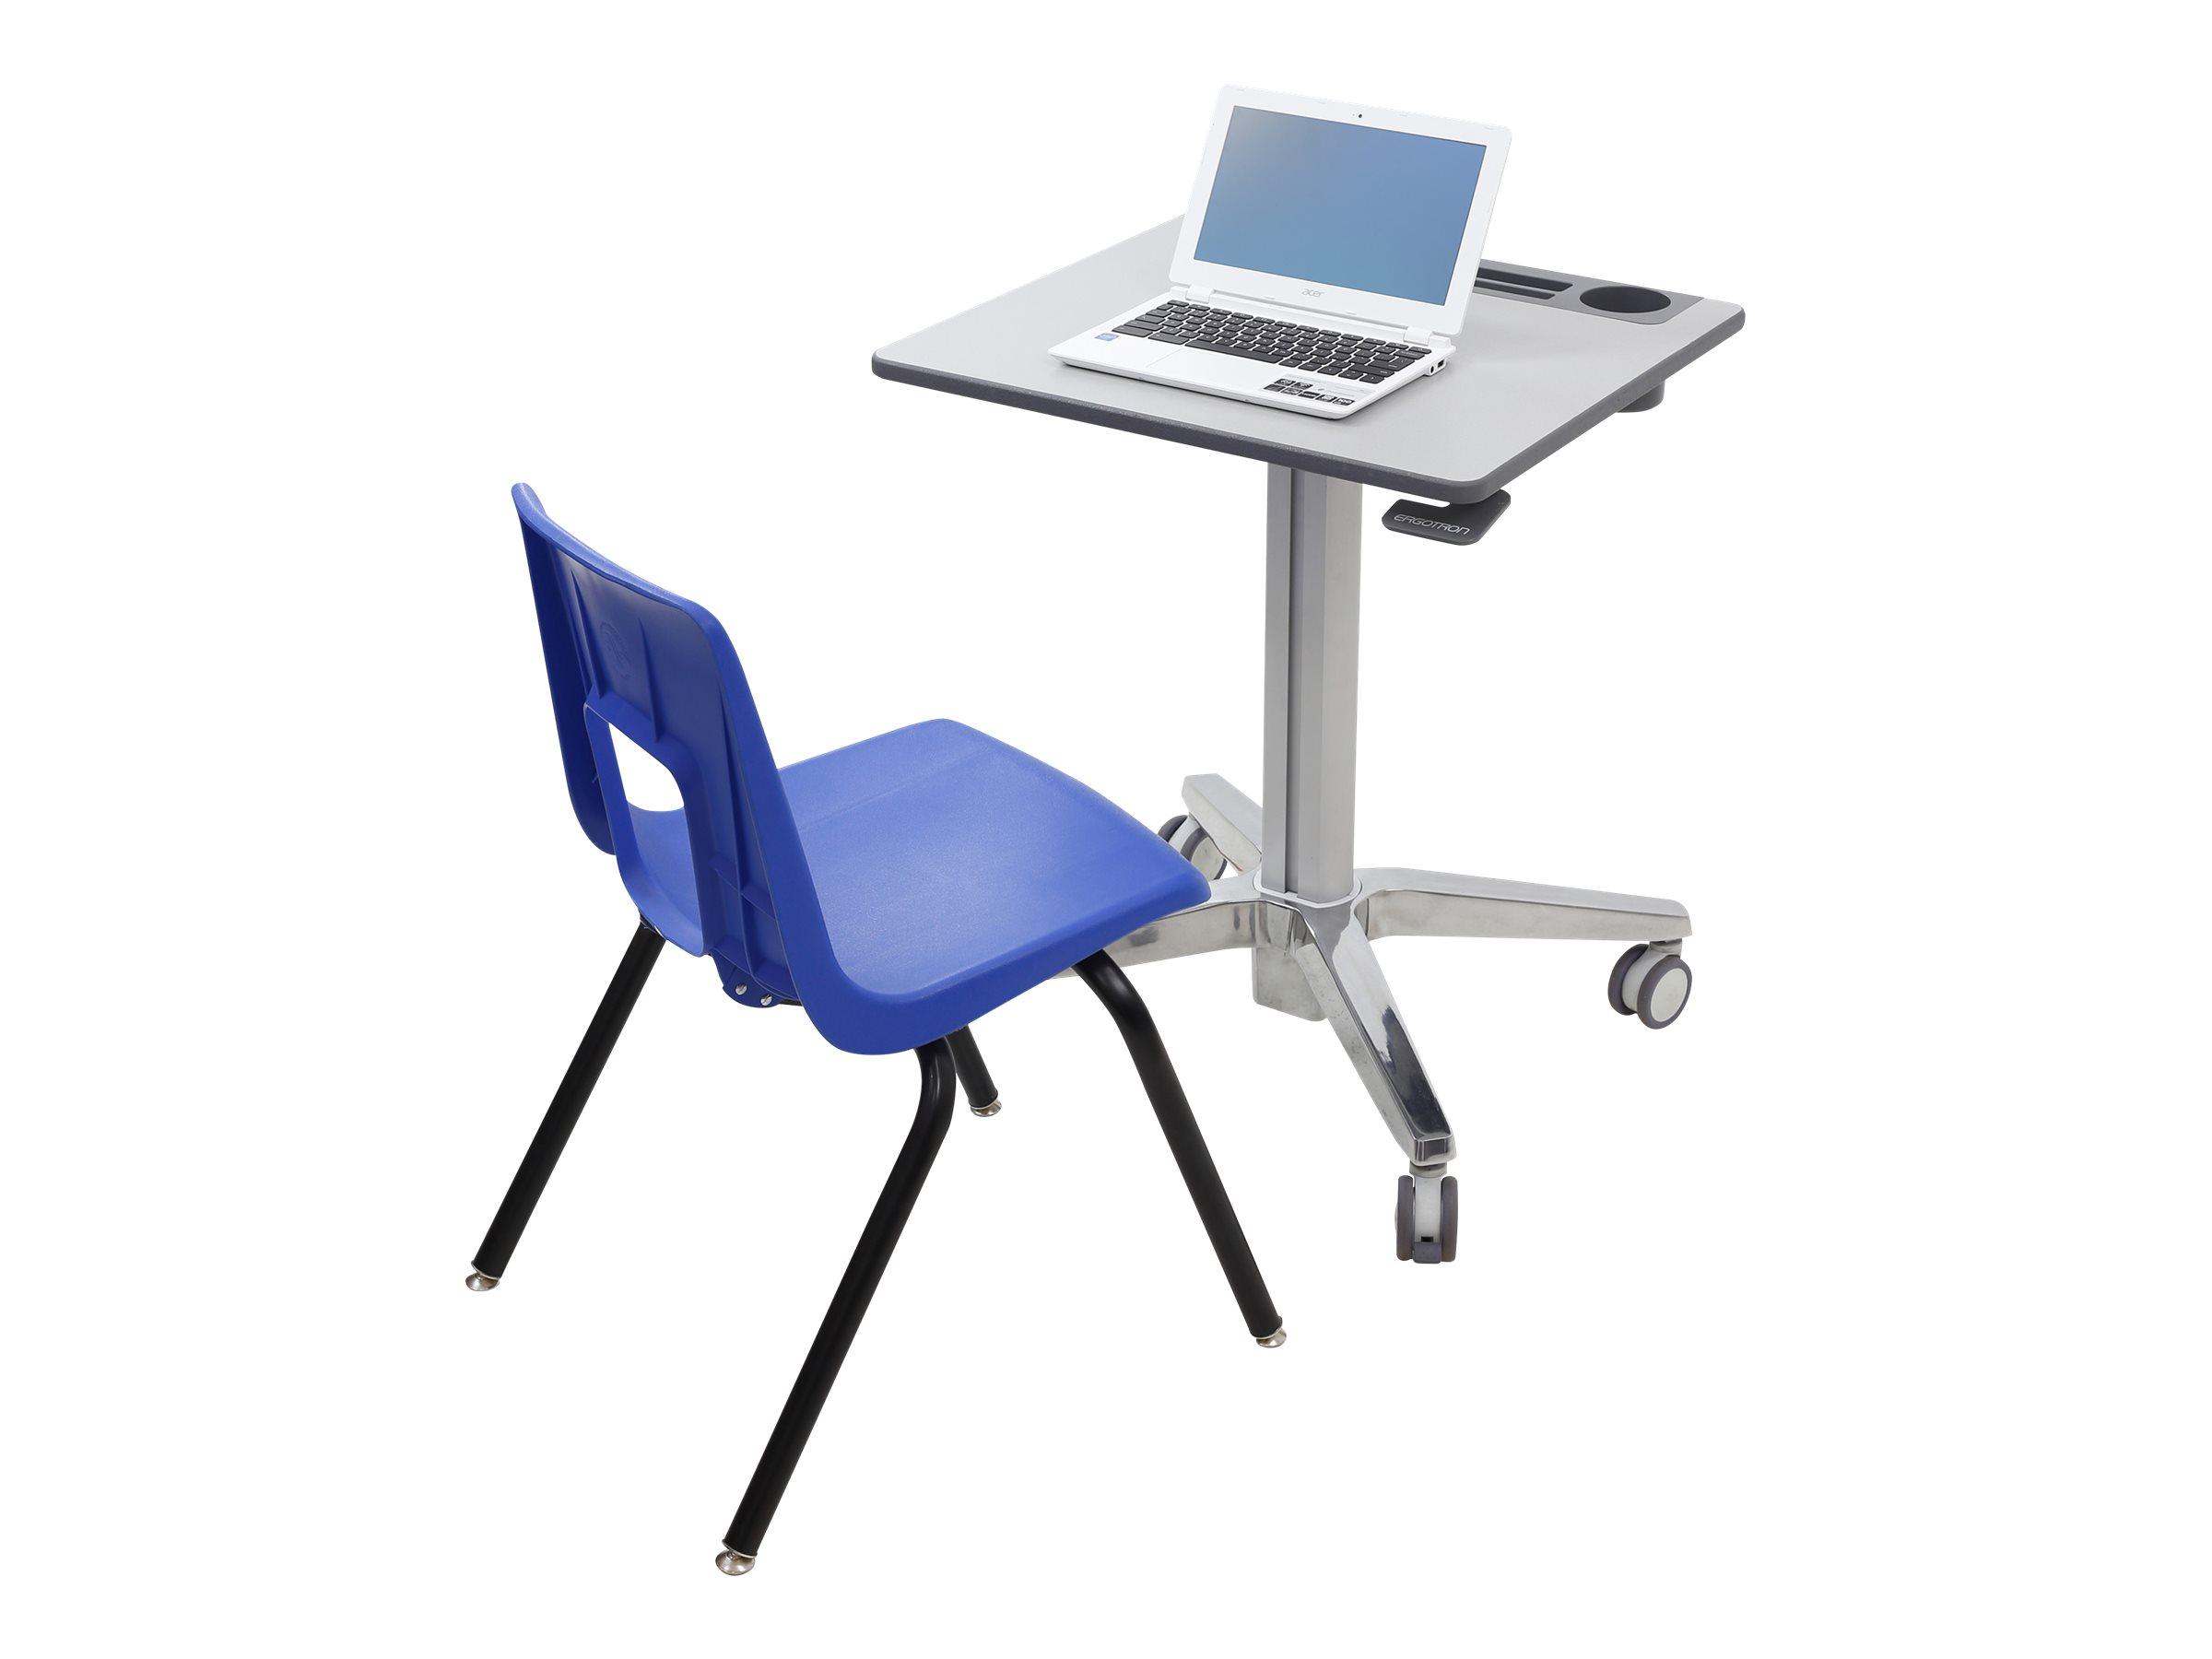 Ergotron LearnFit Sit-Stand Desk - Tisch - mobil - Schule - rechteckig - White Silver